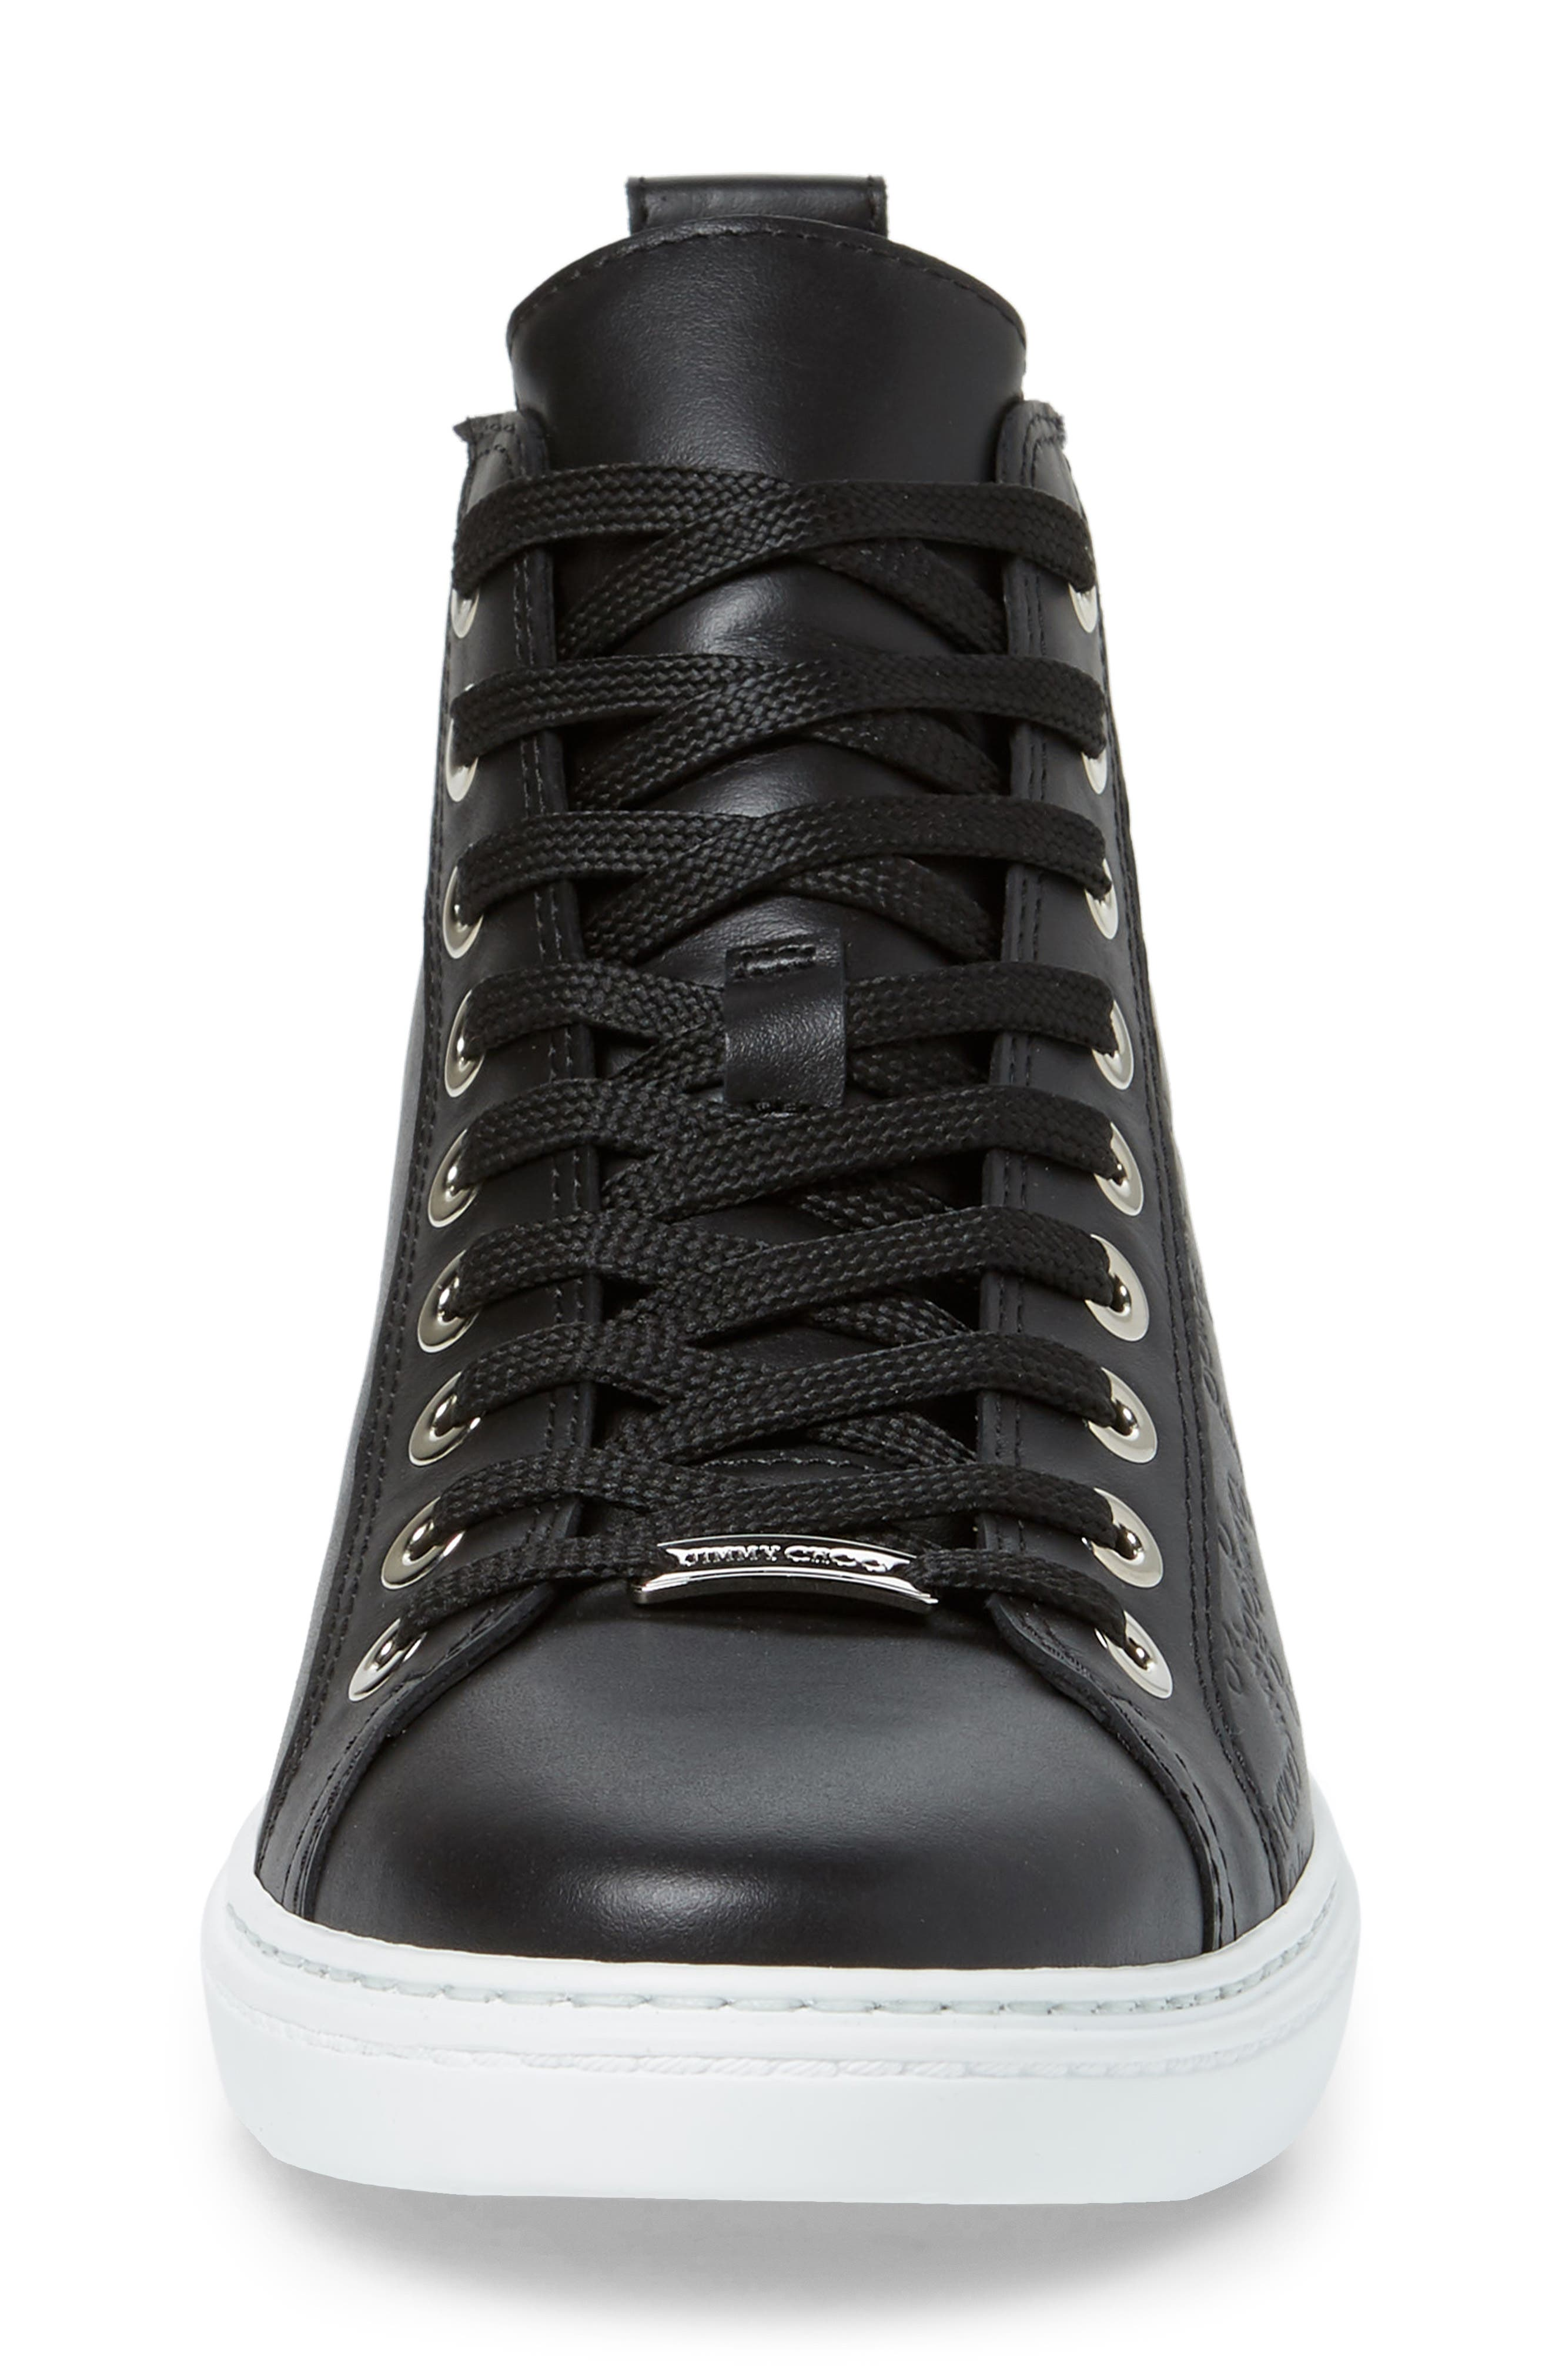 JIMMY CHOO, Colt High Top Sneaker, Alternate thumbnail 4, color, BLACK